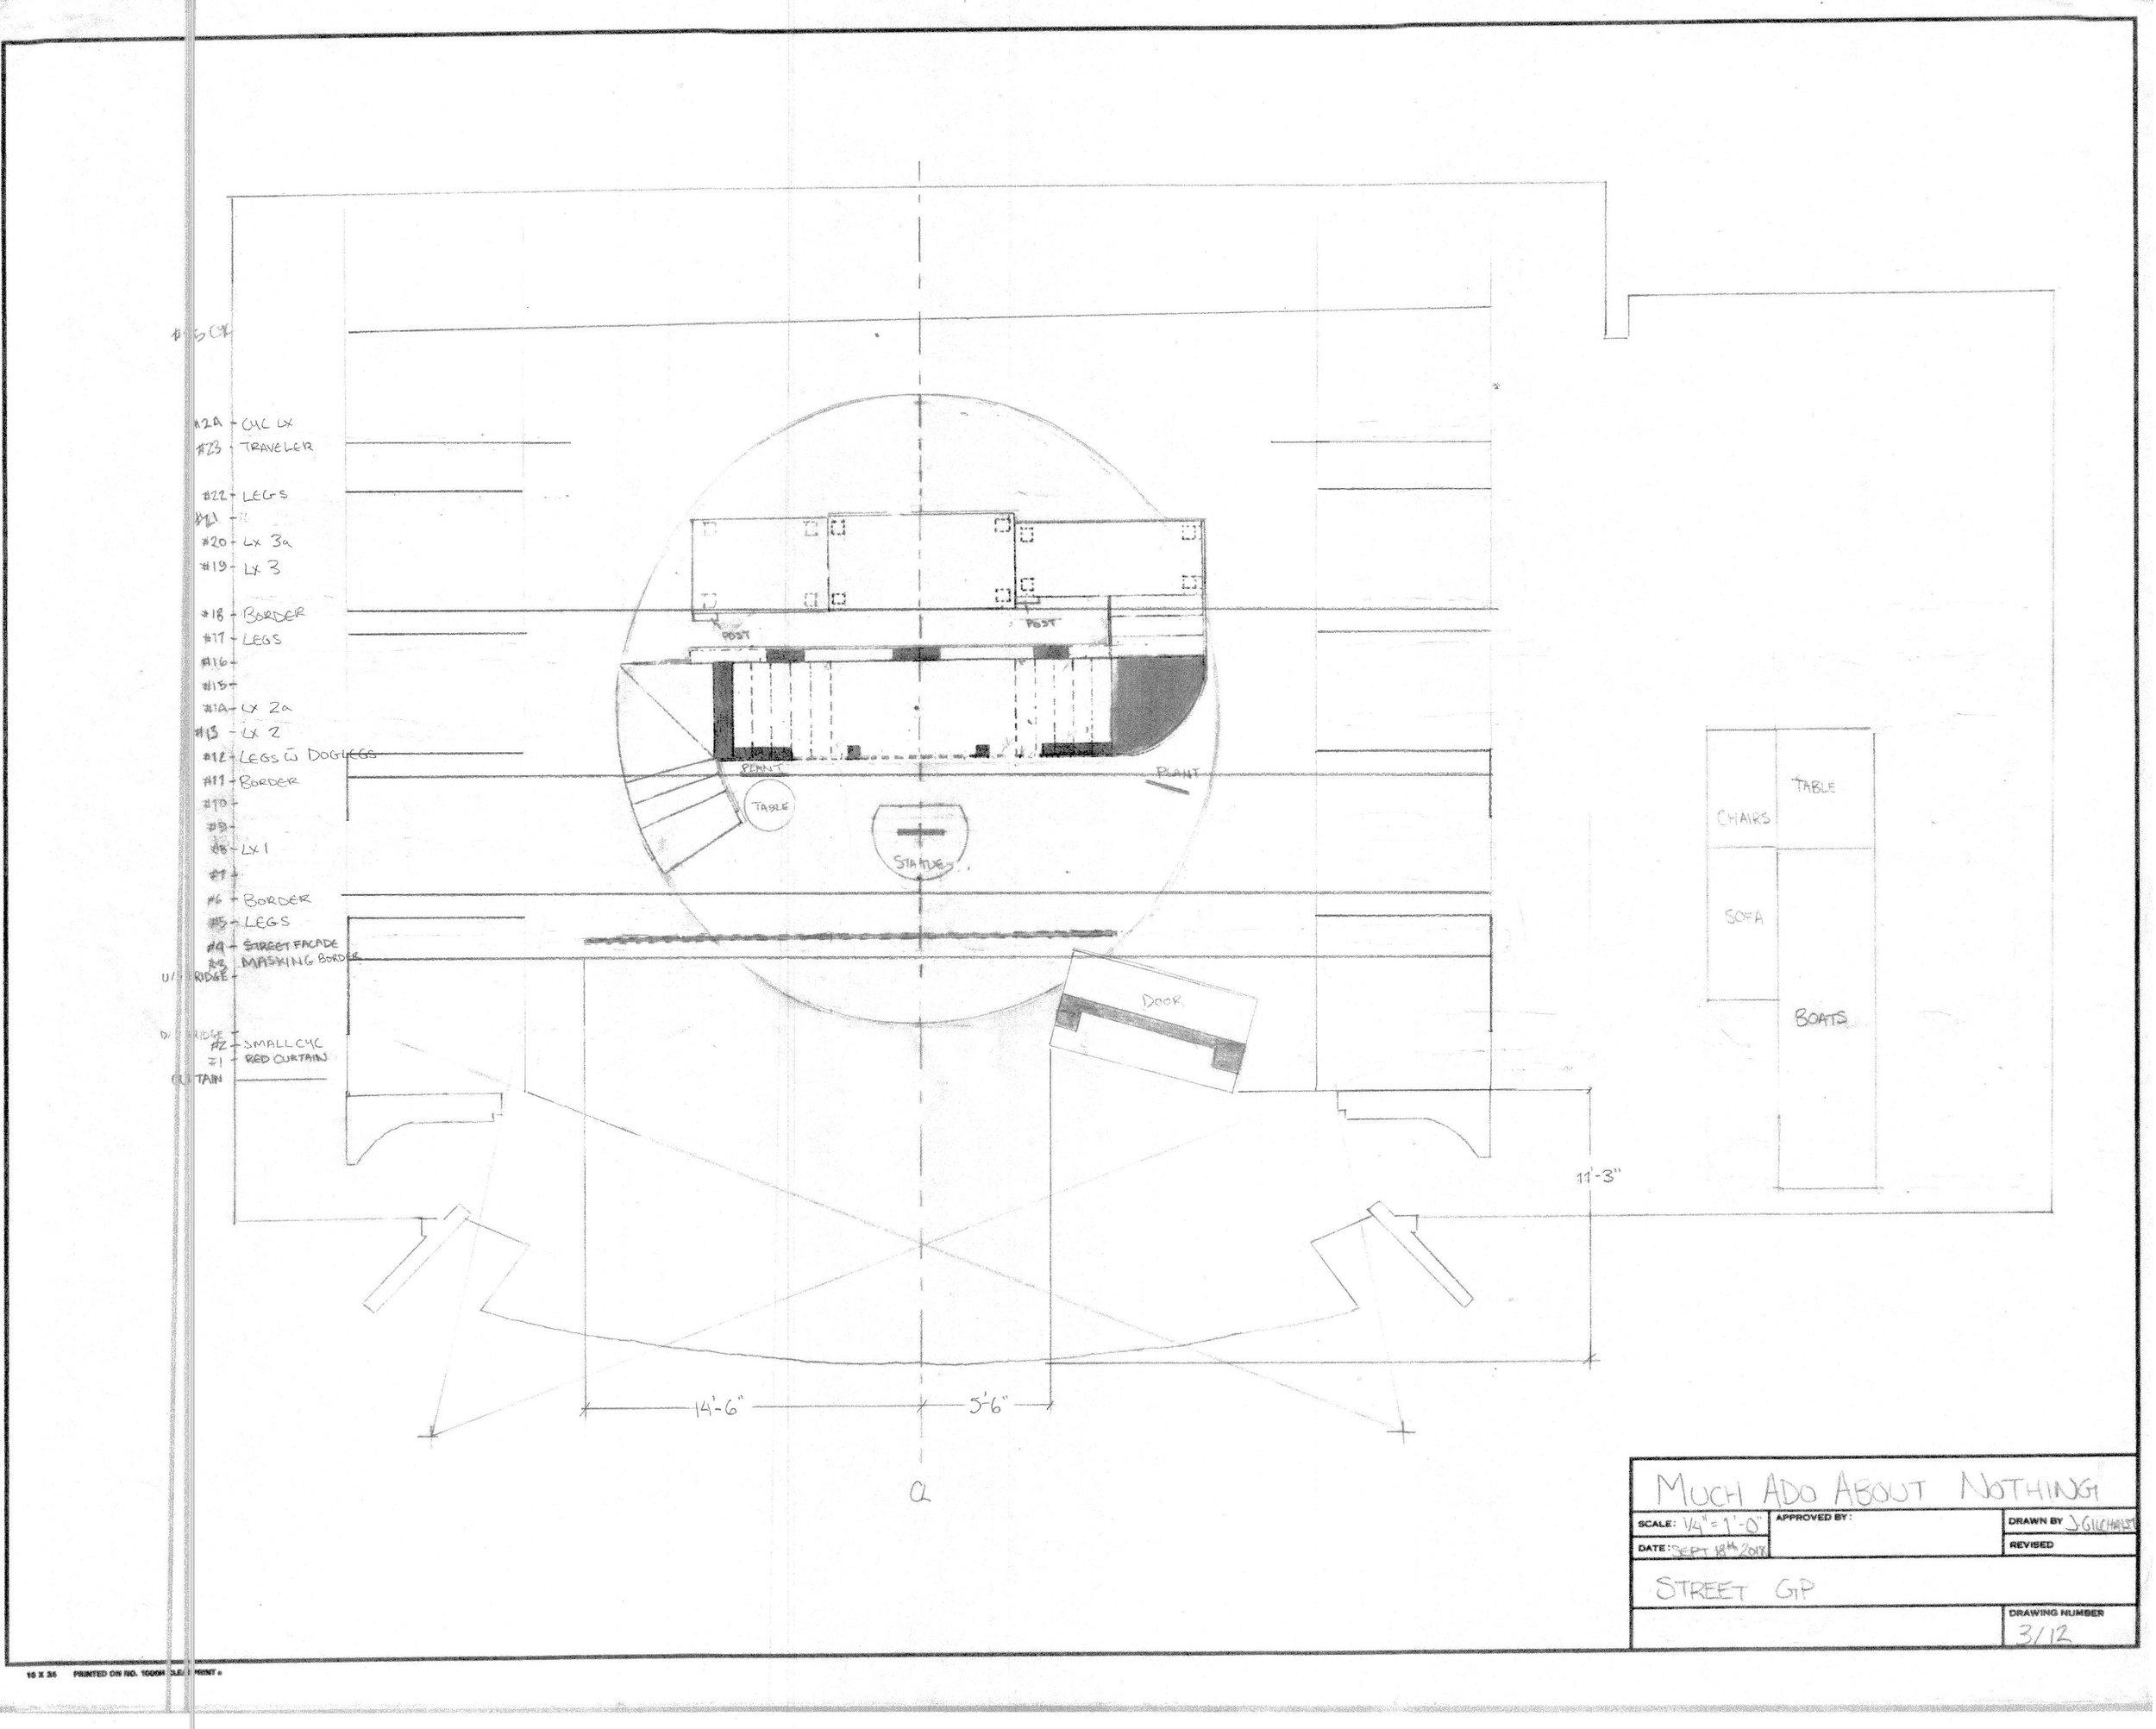 03 Street Ground Plan M-page-001.jpg